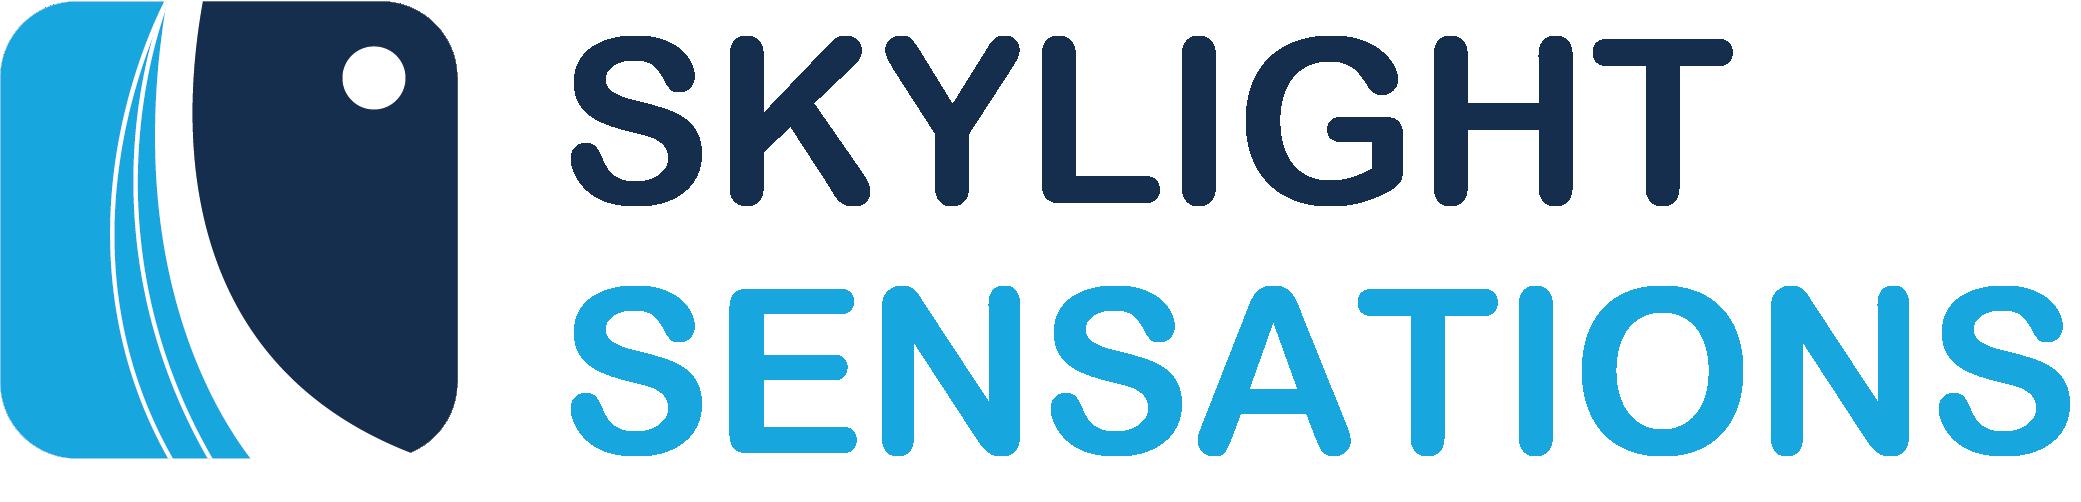 Skylight Sensations